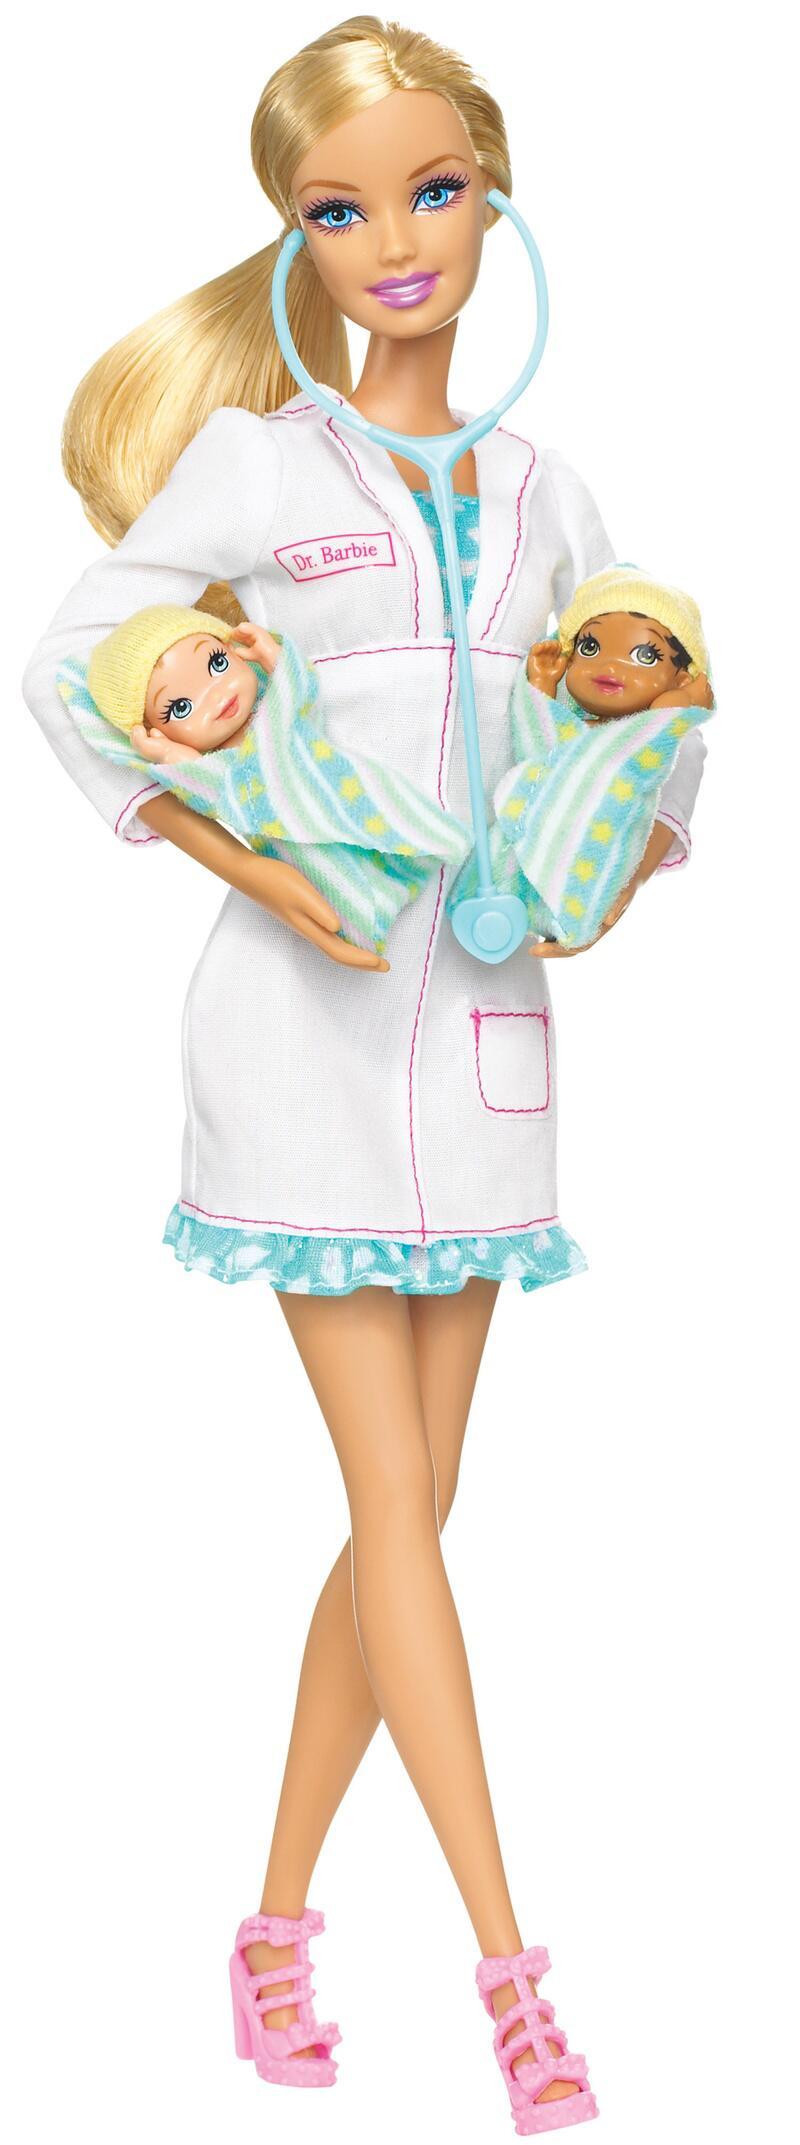 Bild zu 2009 - Kinderärztin - Barbie